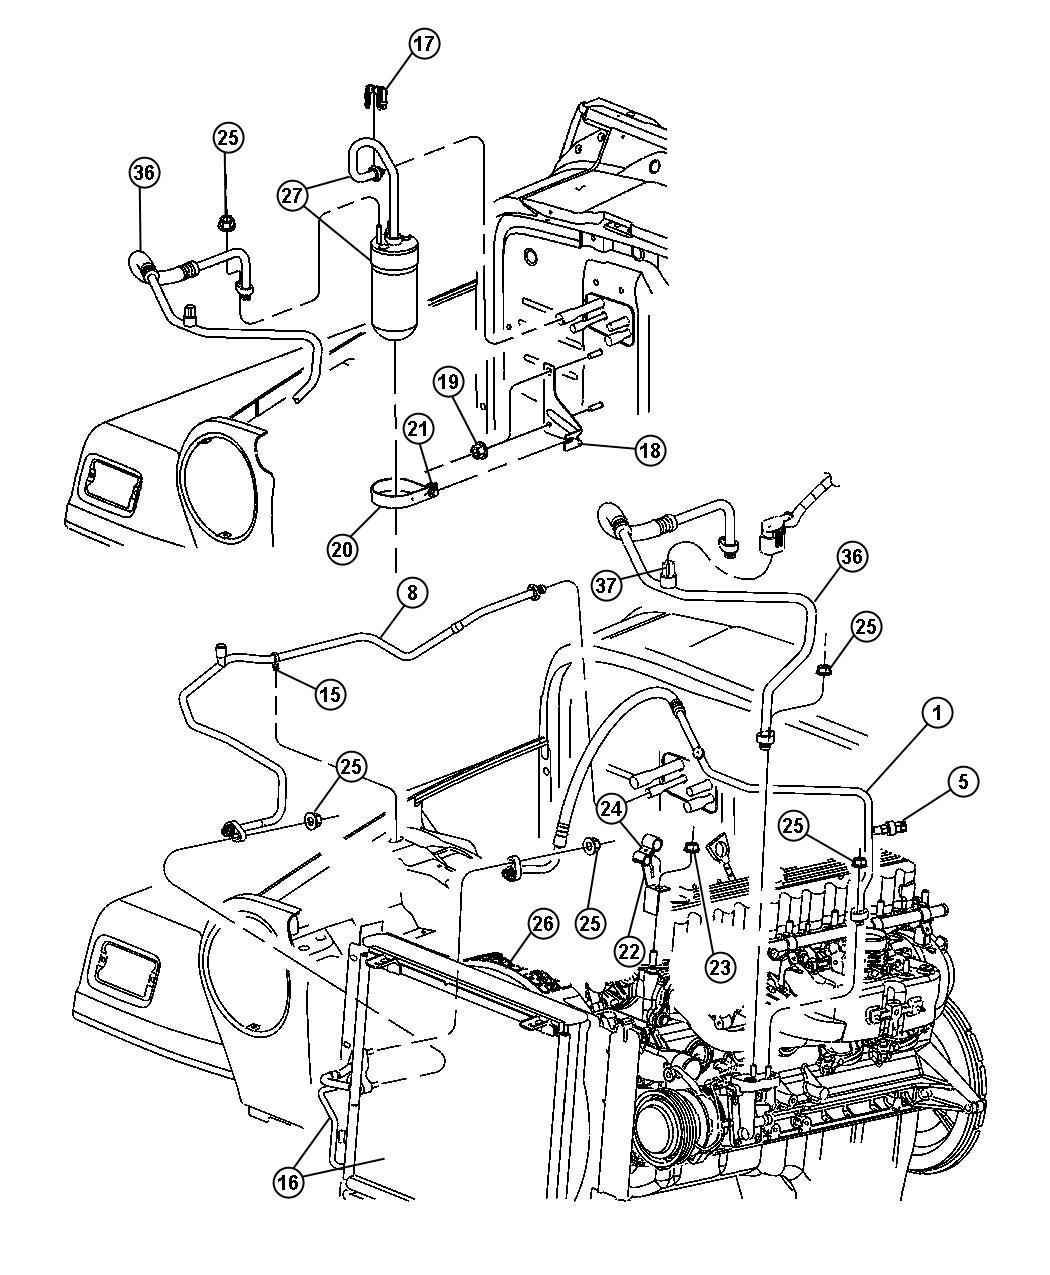 Diagram Jeep Wrangler Parts Diagram Wiring